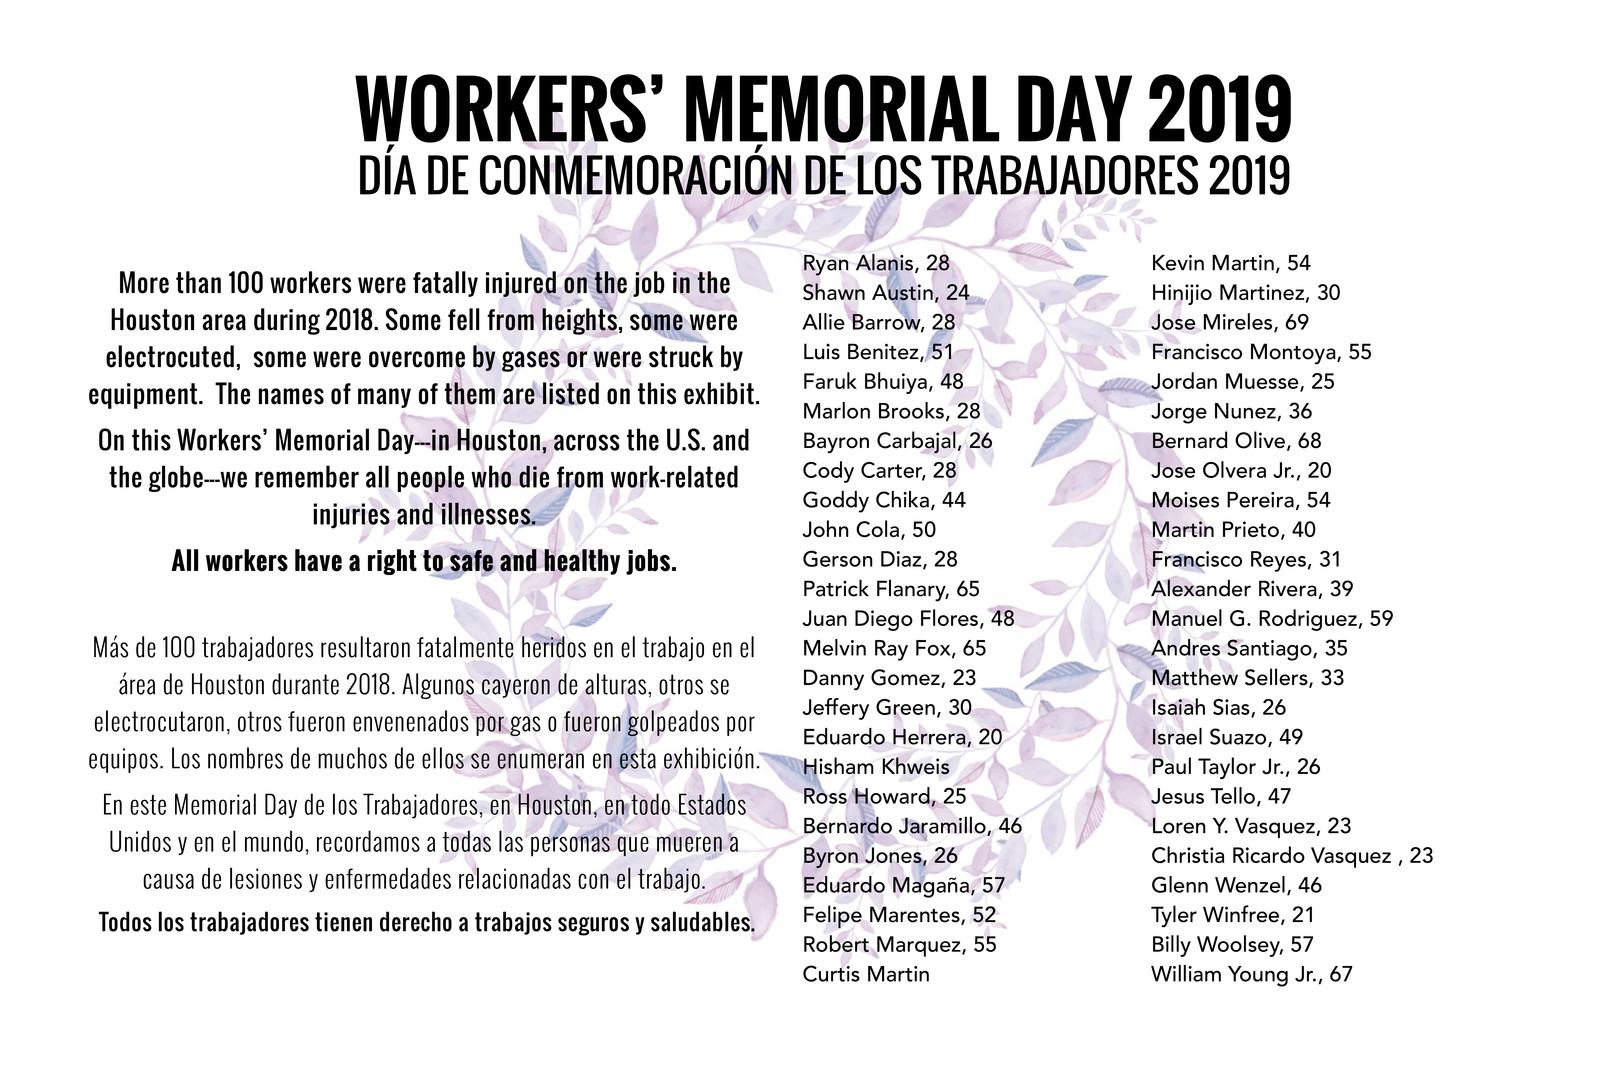 Workers' Memorial Day 2019